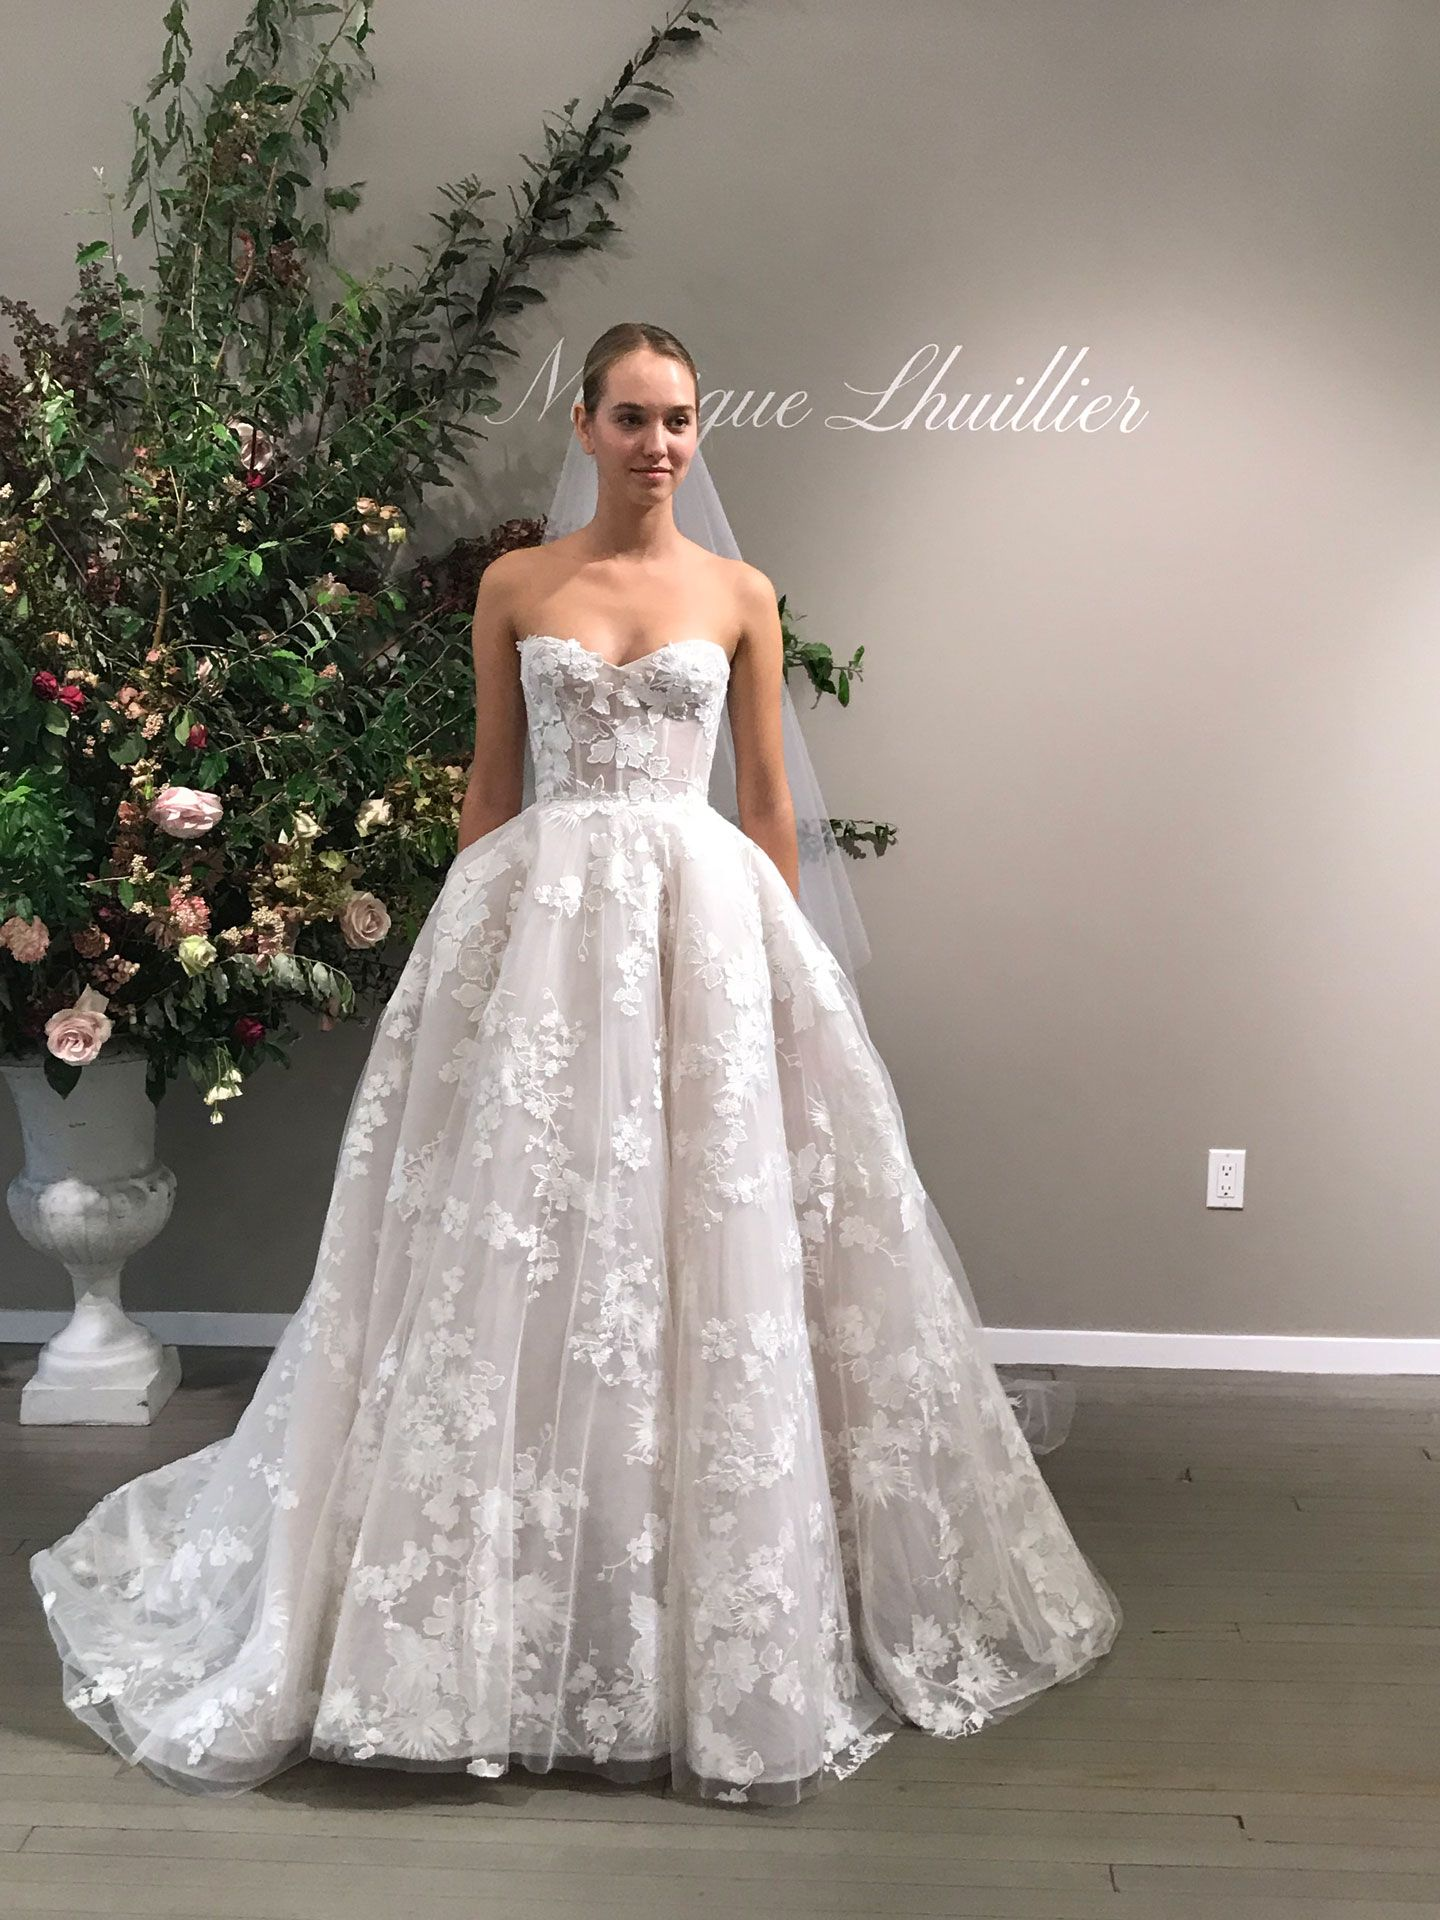 Monique Lhuillier Bridal Fall 2019 Bridal And Formal Monique Lhuillier Wedding Dress Monique Lhuillier Bridal Designer Wedding Dresses